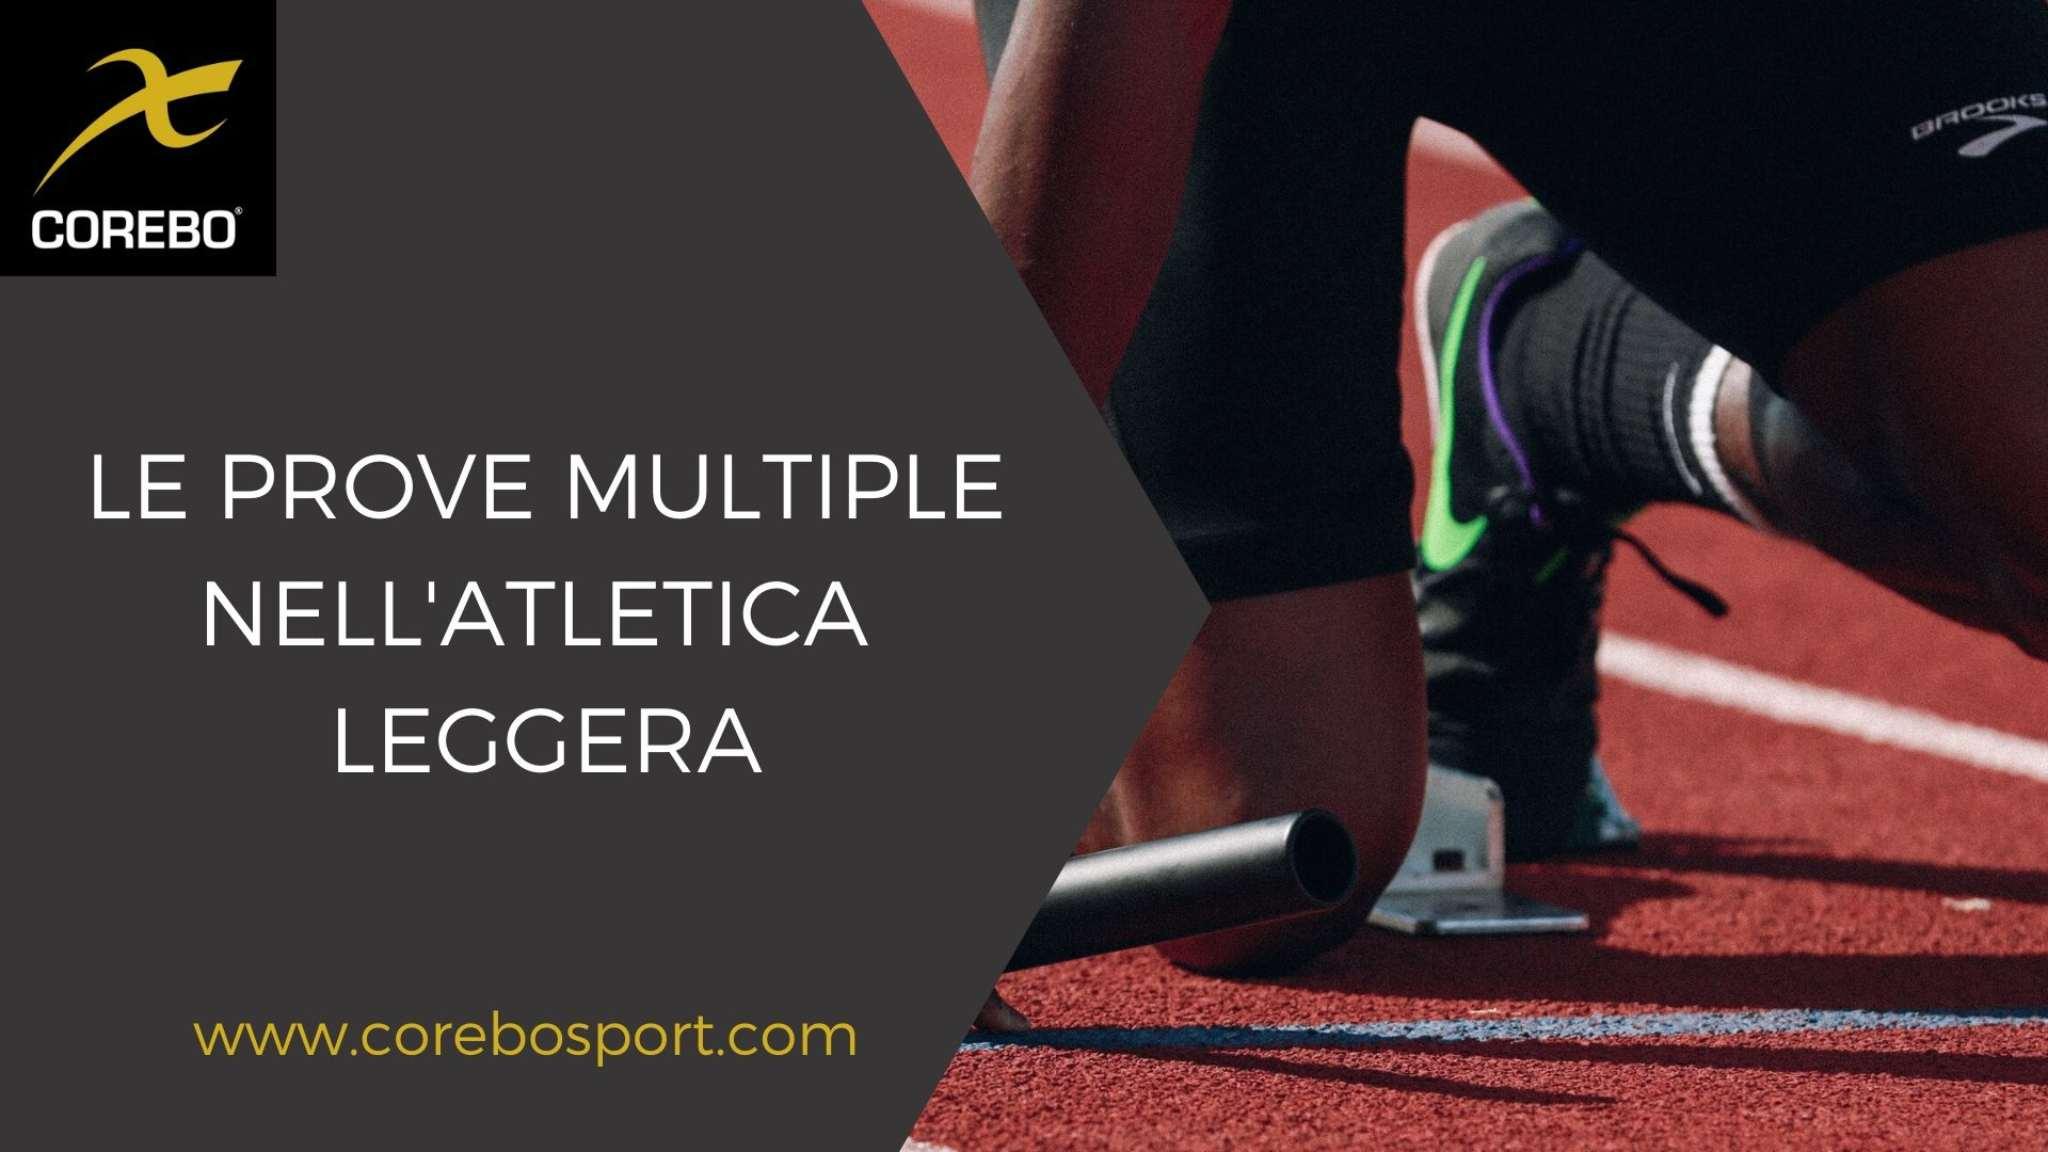 Le prove multiple nell'atletica leggera